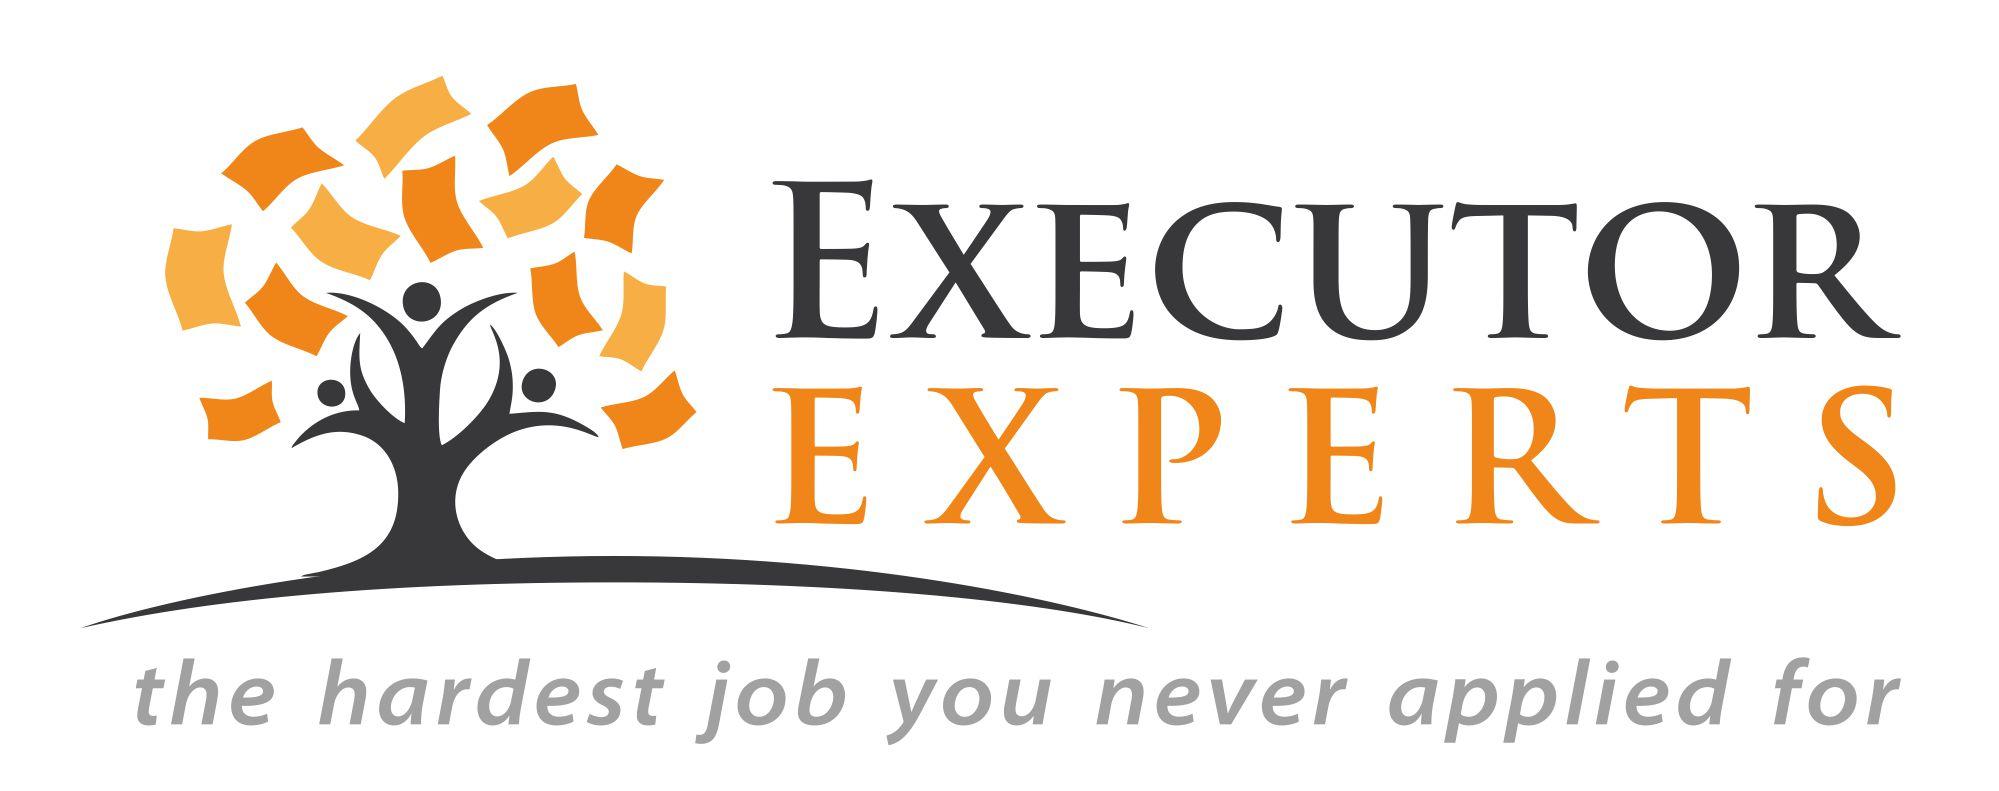 executor experts logo 5.jpg